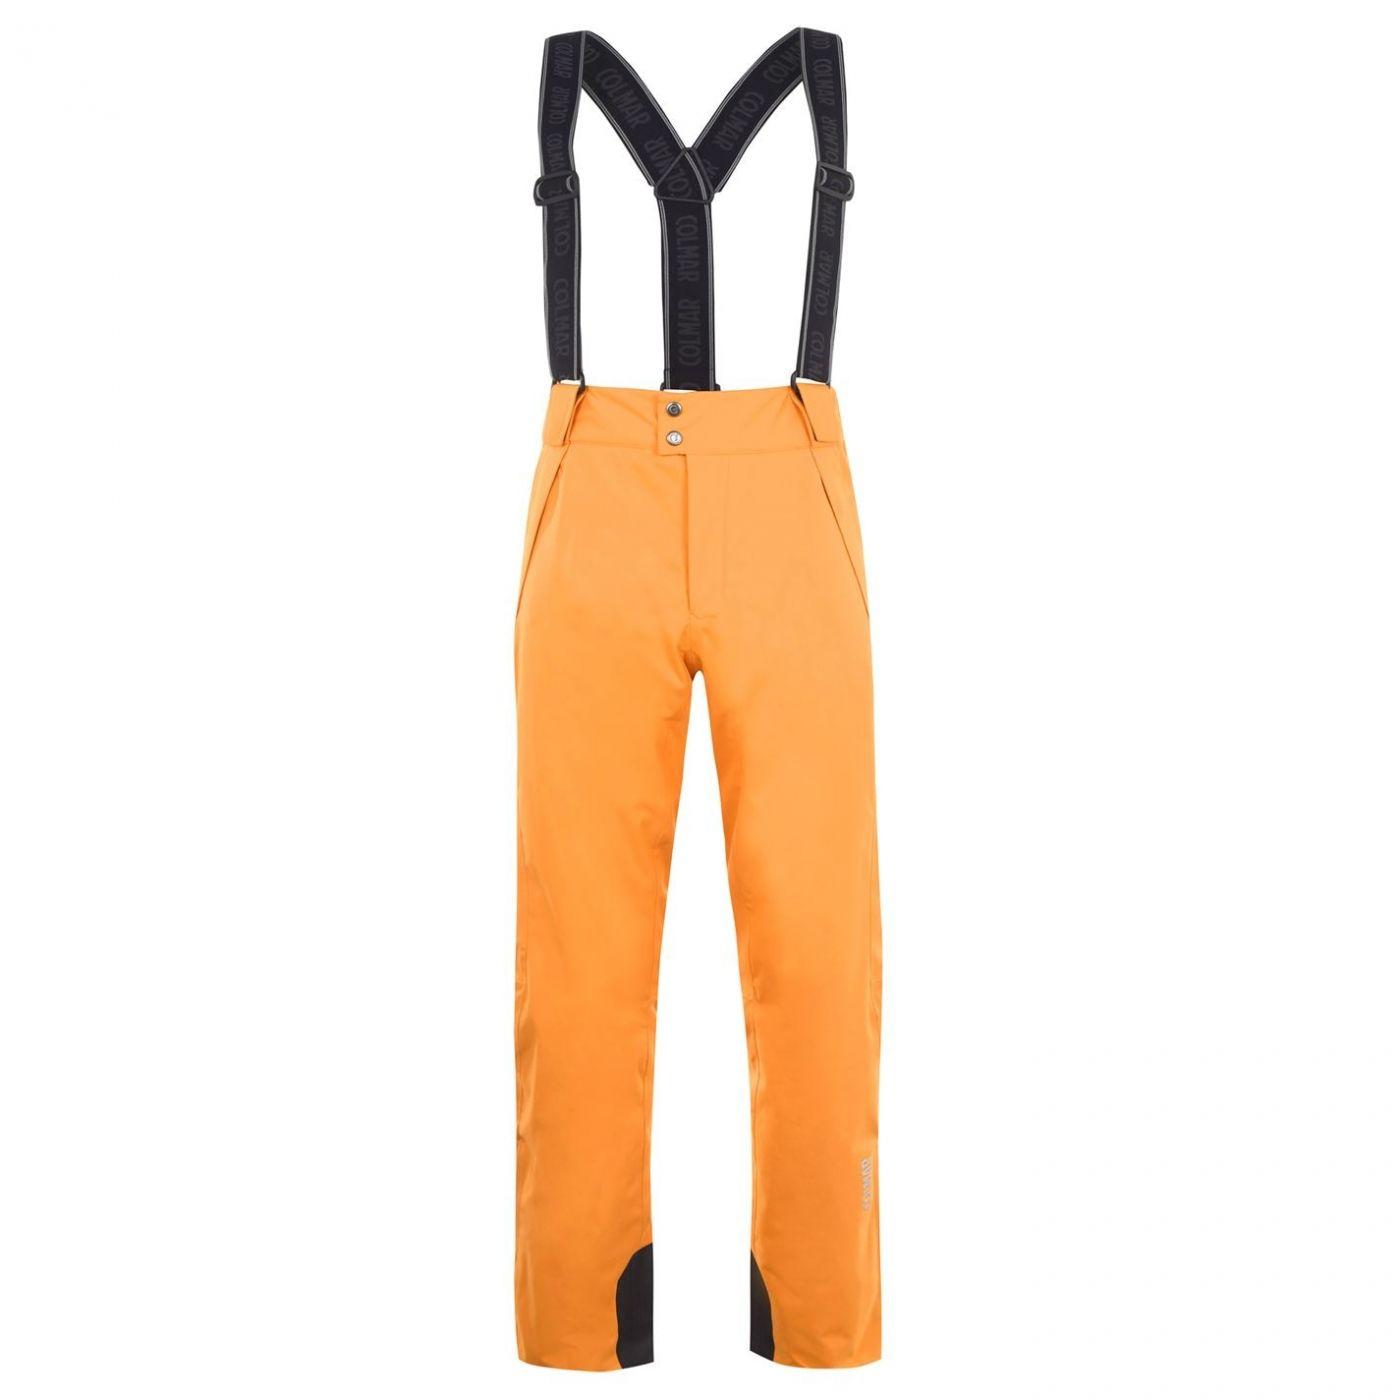 Colmar 1416 Ski Pants Mens